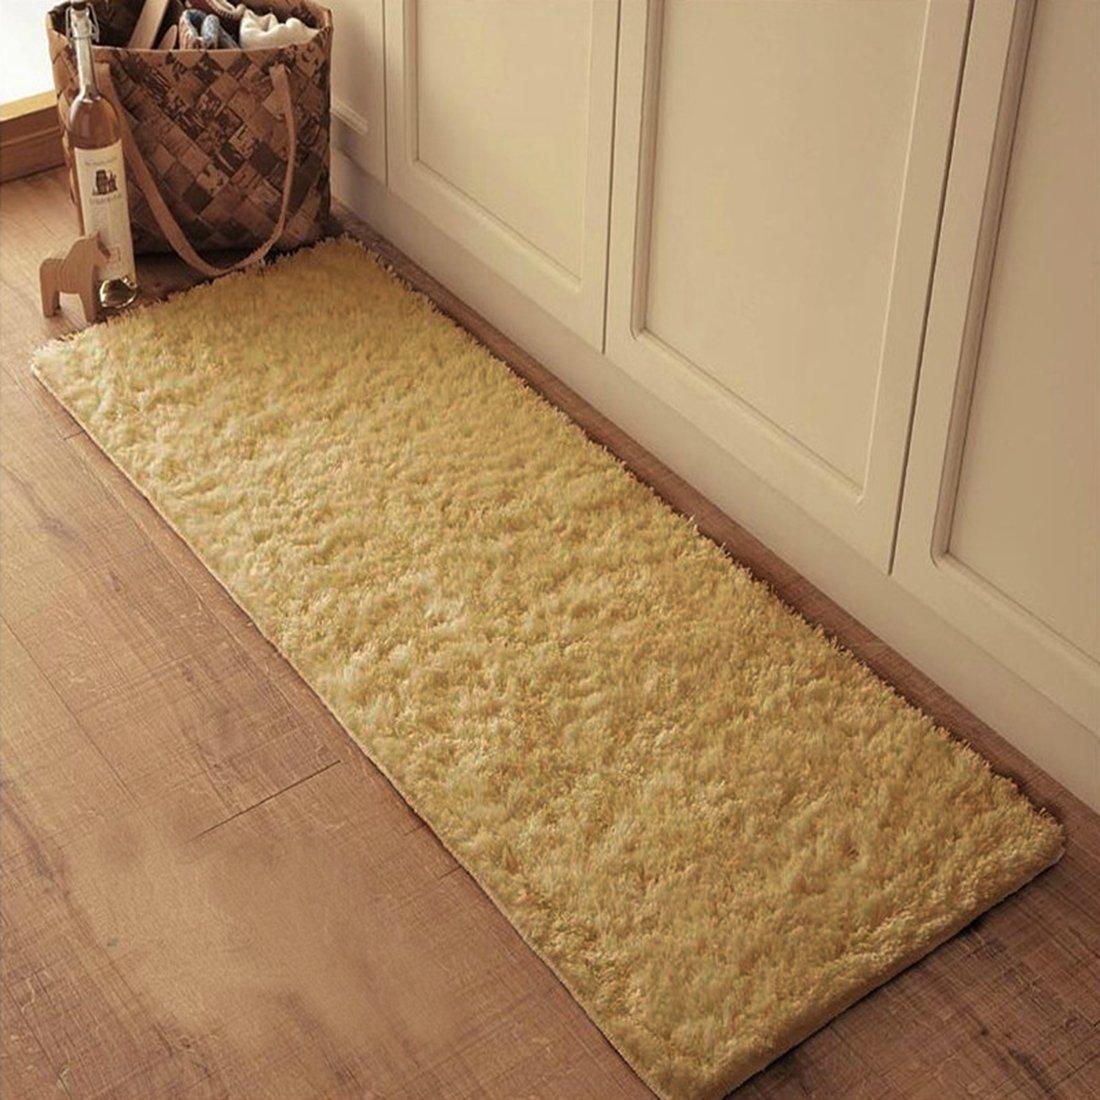 JTENGYAO Non-slip Chenille Fabric Shag Bedroom Kitchen Sofa Bathroom Mat-23.6 x 47.2 Inch